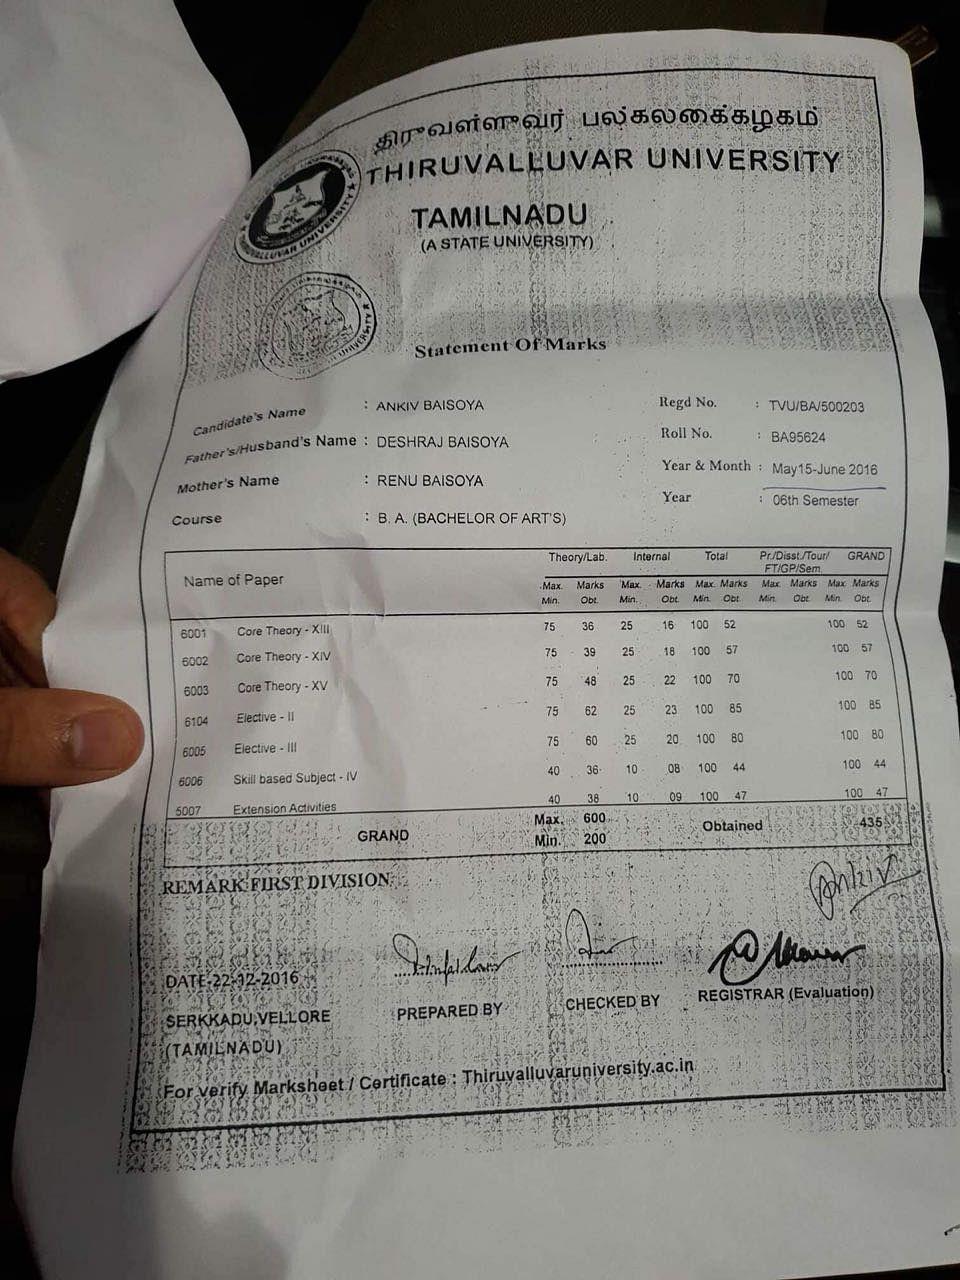 Ankiv Baisoya's marksheet in possession of NSUI.